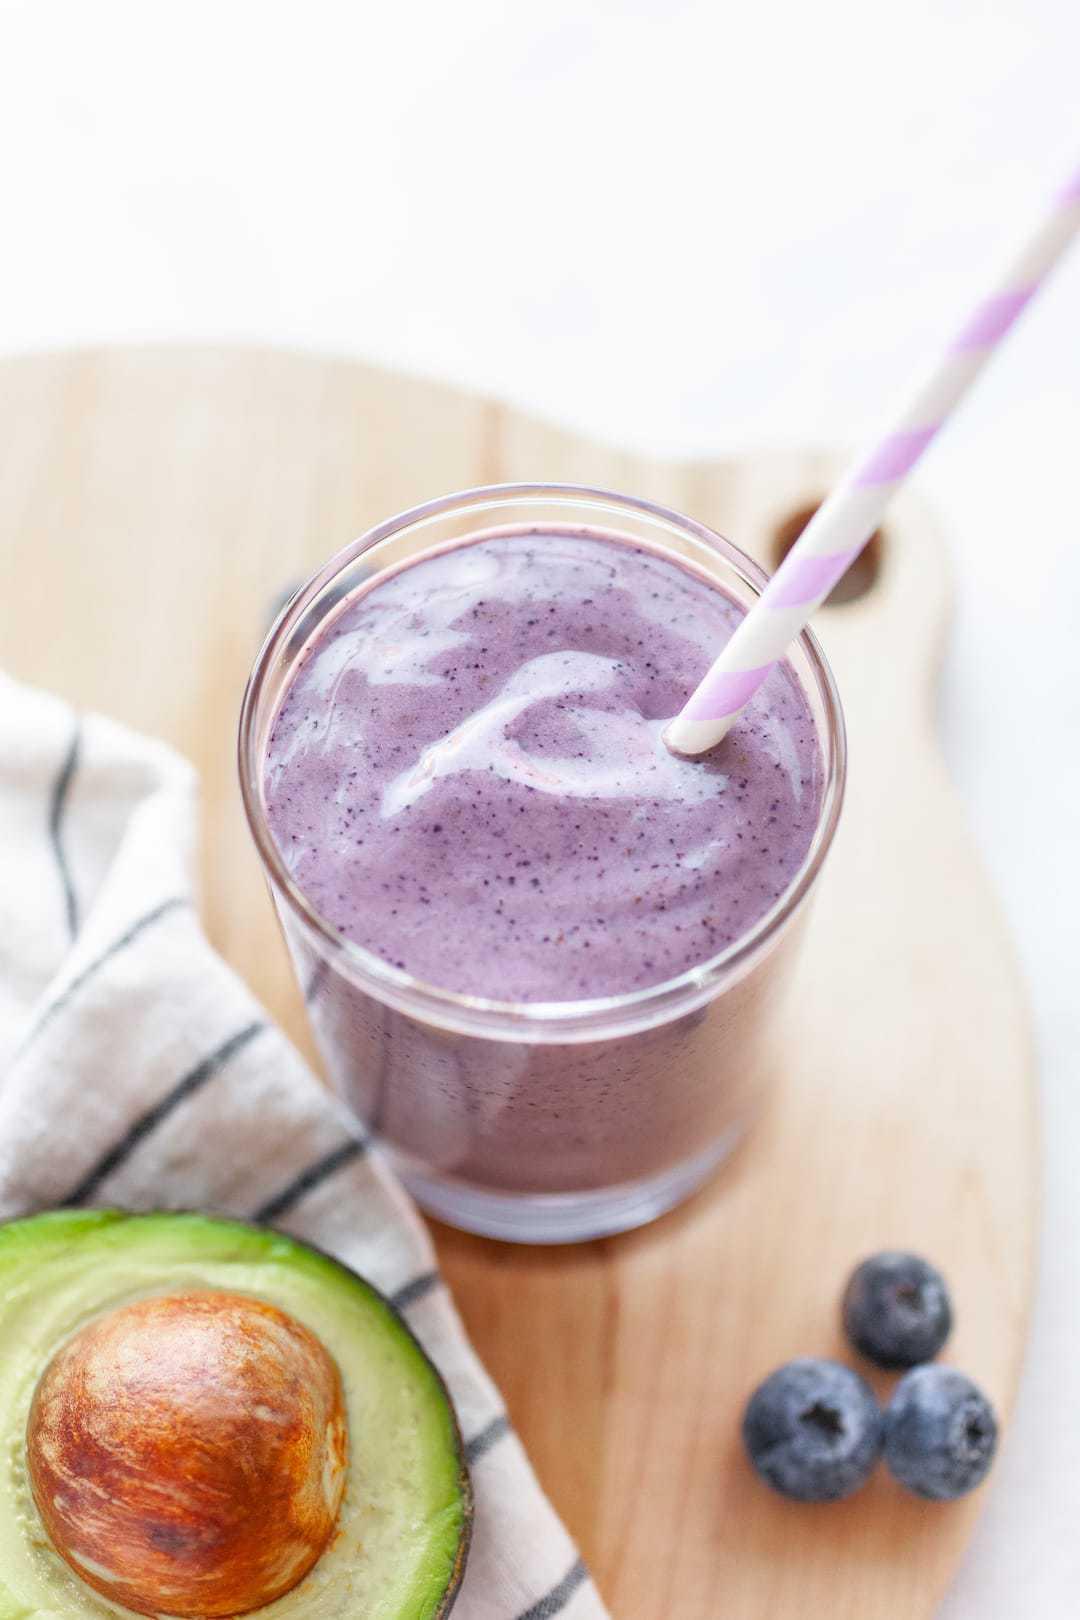 17 Low FODMAP Breakfast Ideas - Blueberry Smoothie